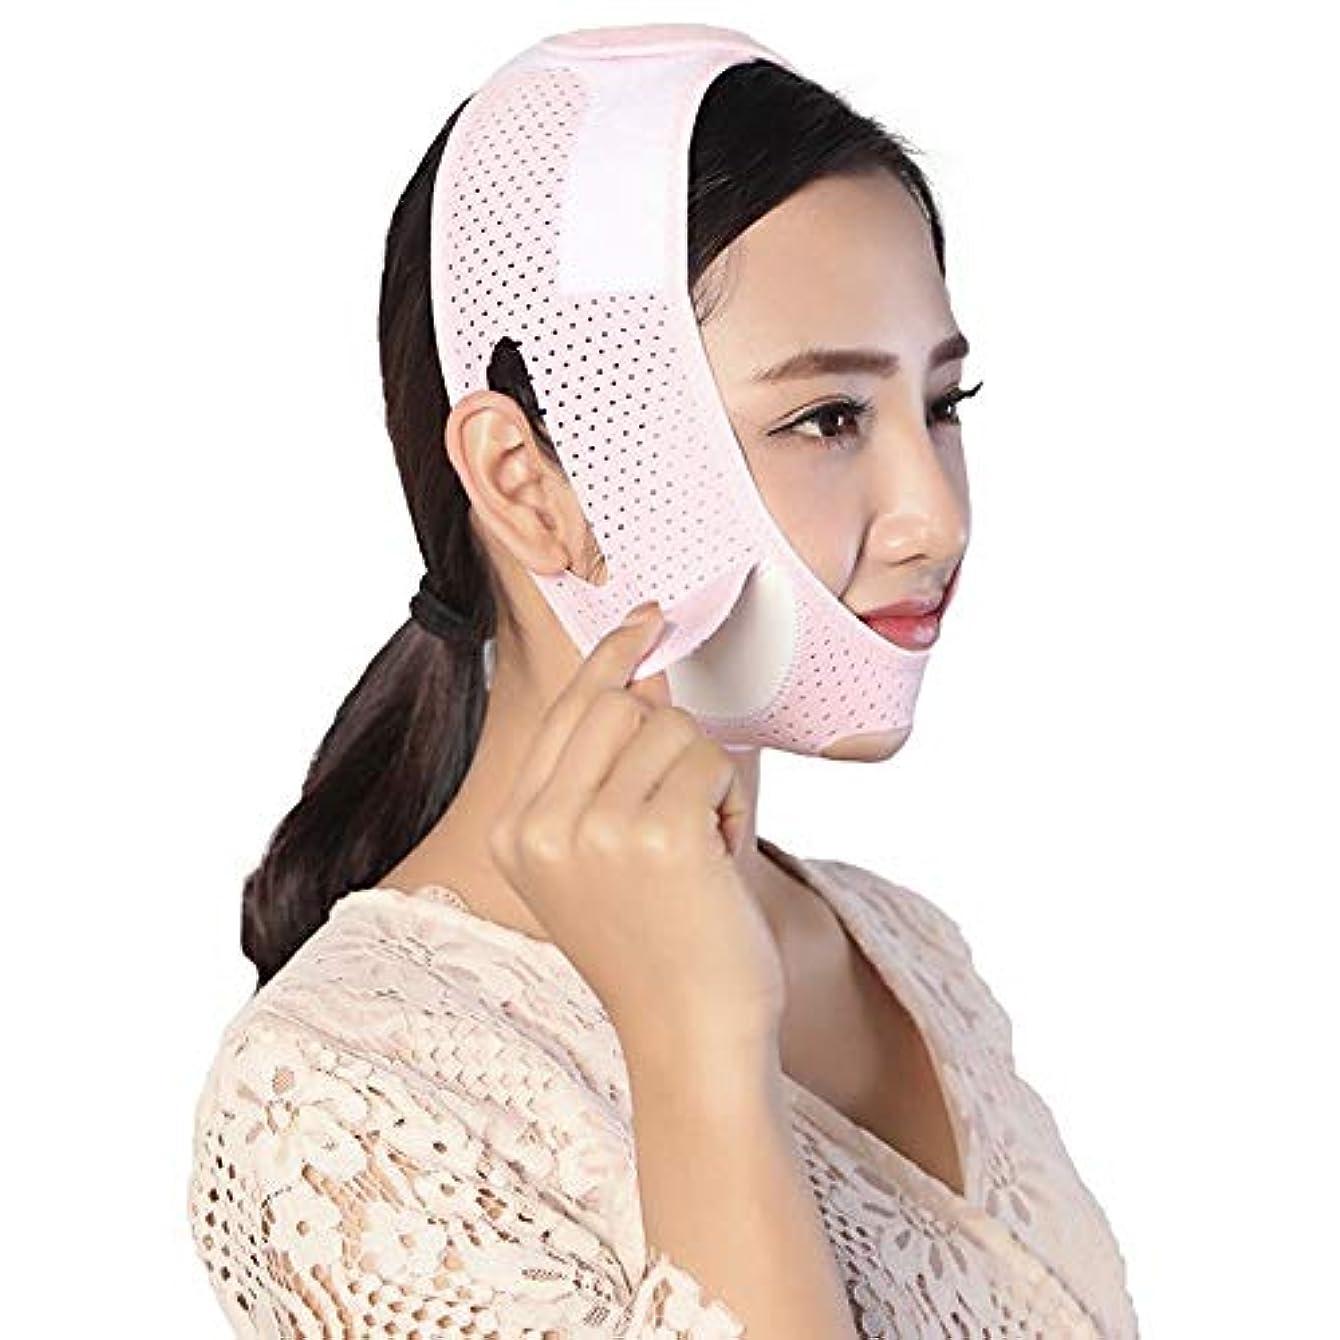 XINGZHE フェイシャルリフティング痩身ベルト - 圧縮二重あご減量ベルトスキンケア薄い顔包帯 フェイスリフティングベルト